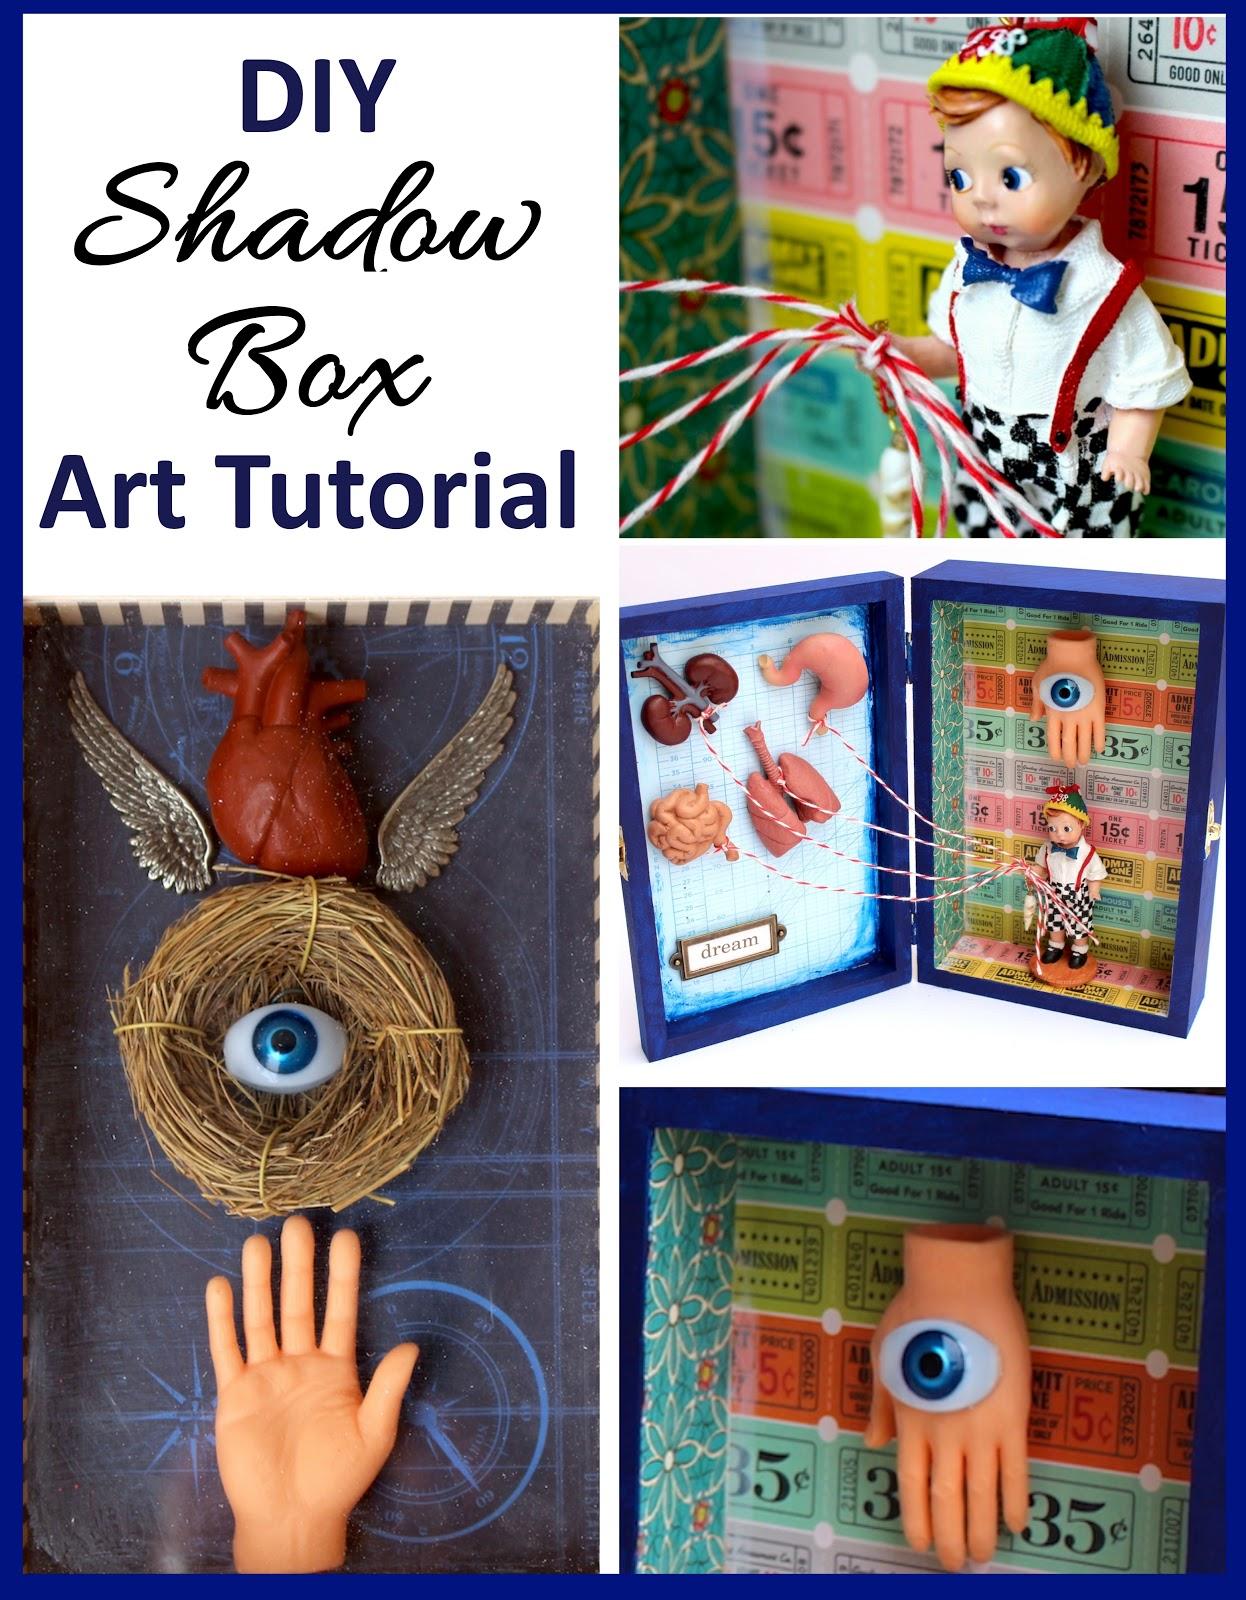 unique diy shadow box art tutorial. Black Bedroom Furniture Sets. Home Design Ideas